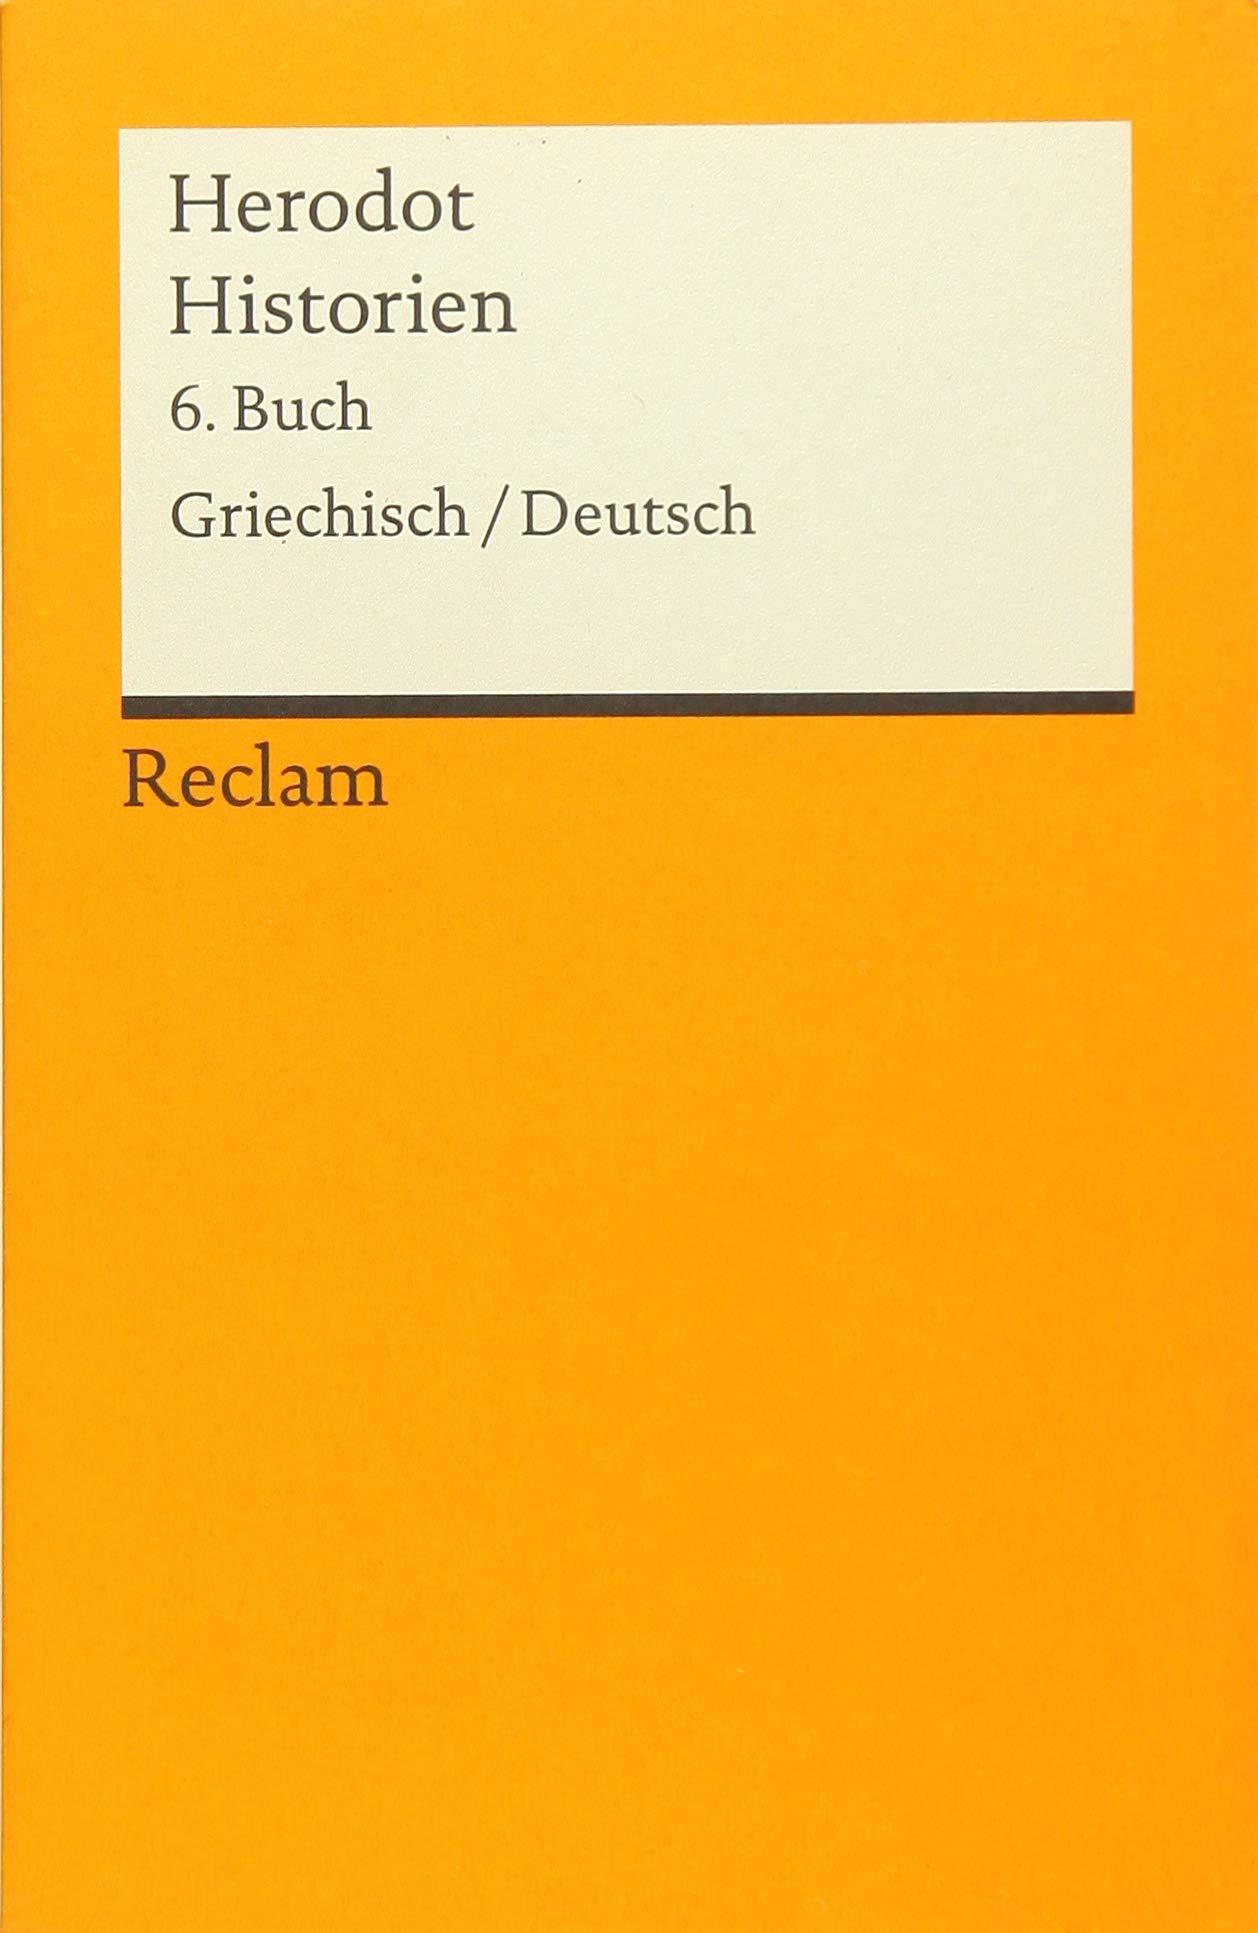 Historien. 6. Buch: Griechisch/Deutsch (Reclams Universal-Bibliothek)